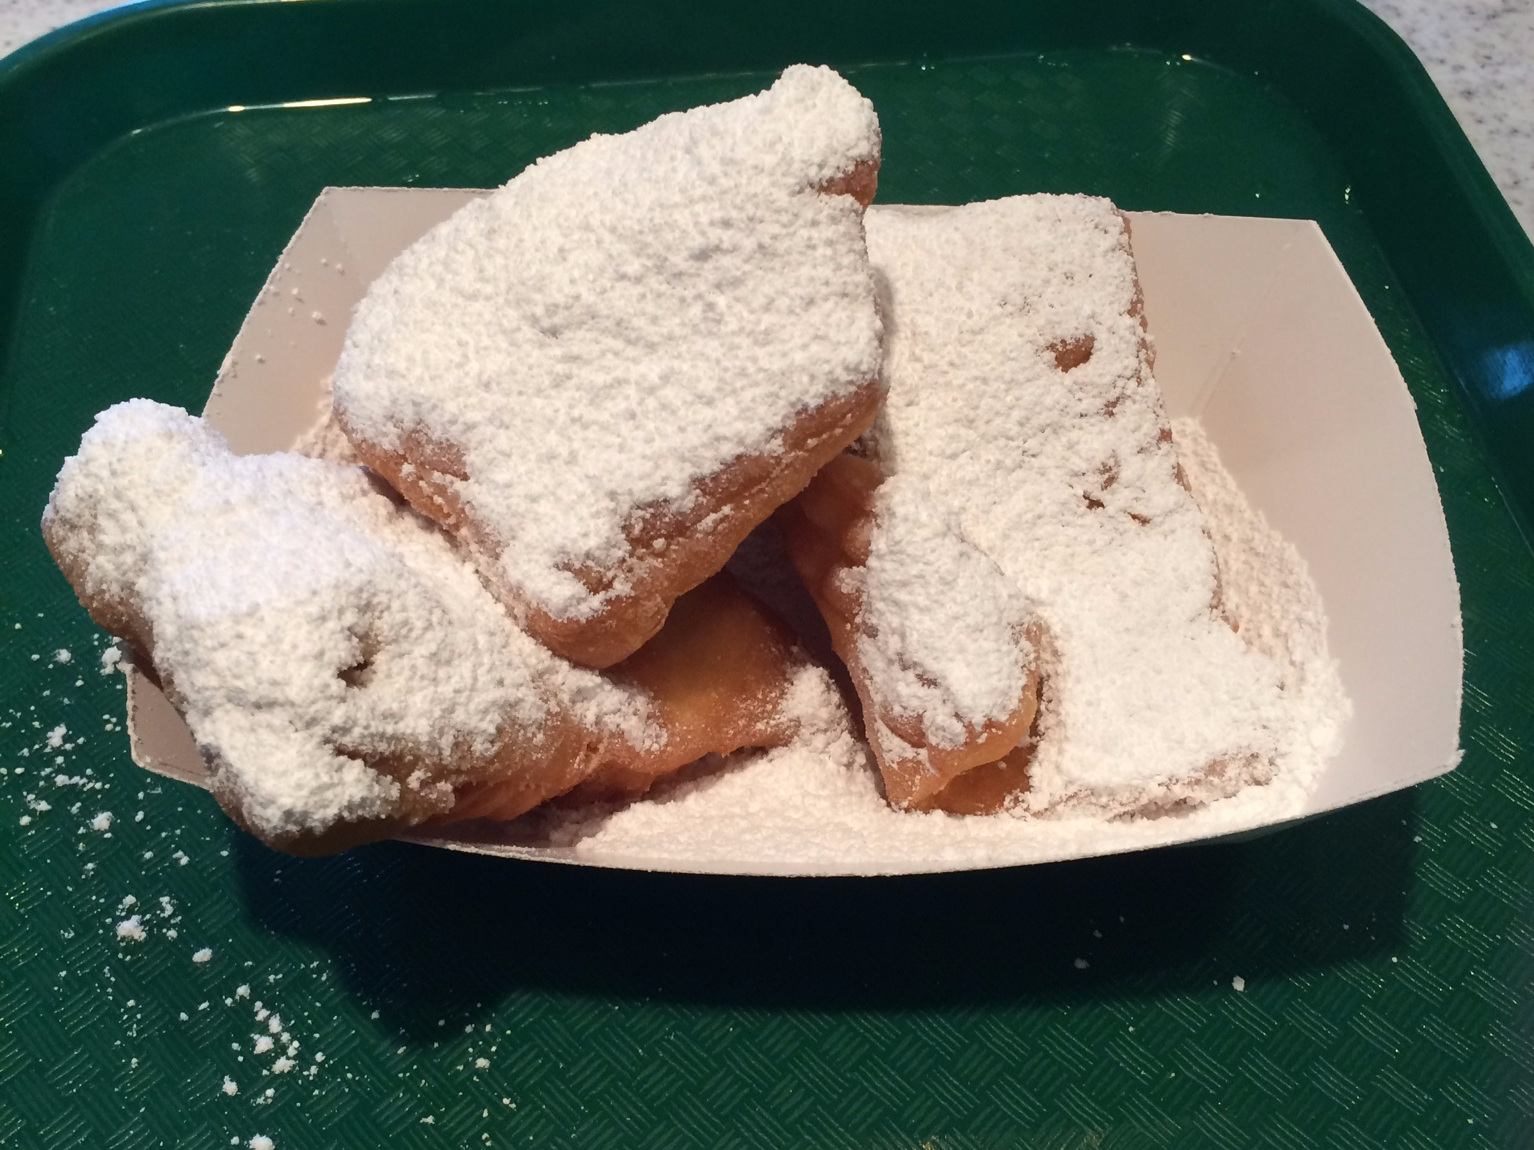 New Orleans Cafe du Monde - beignets